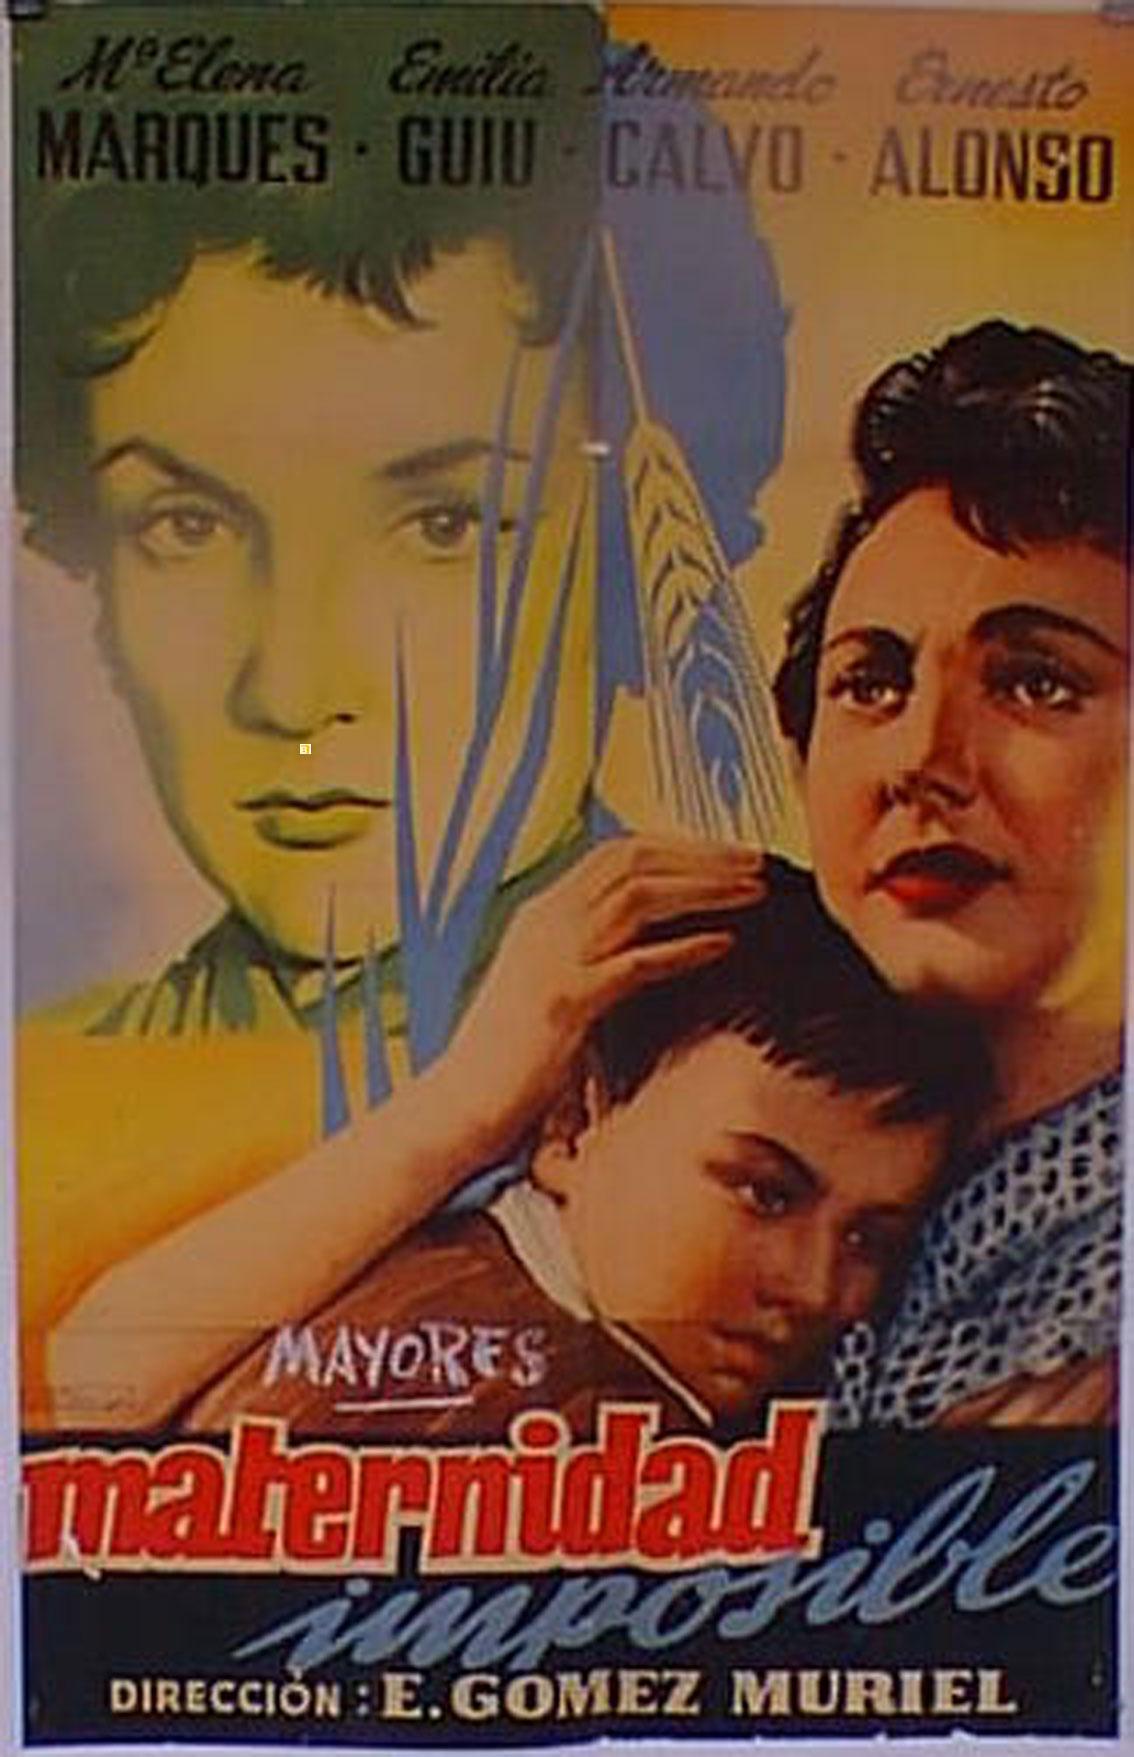 Quot Maternidad Imposible Quot Movie Poster Quot Maternidad